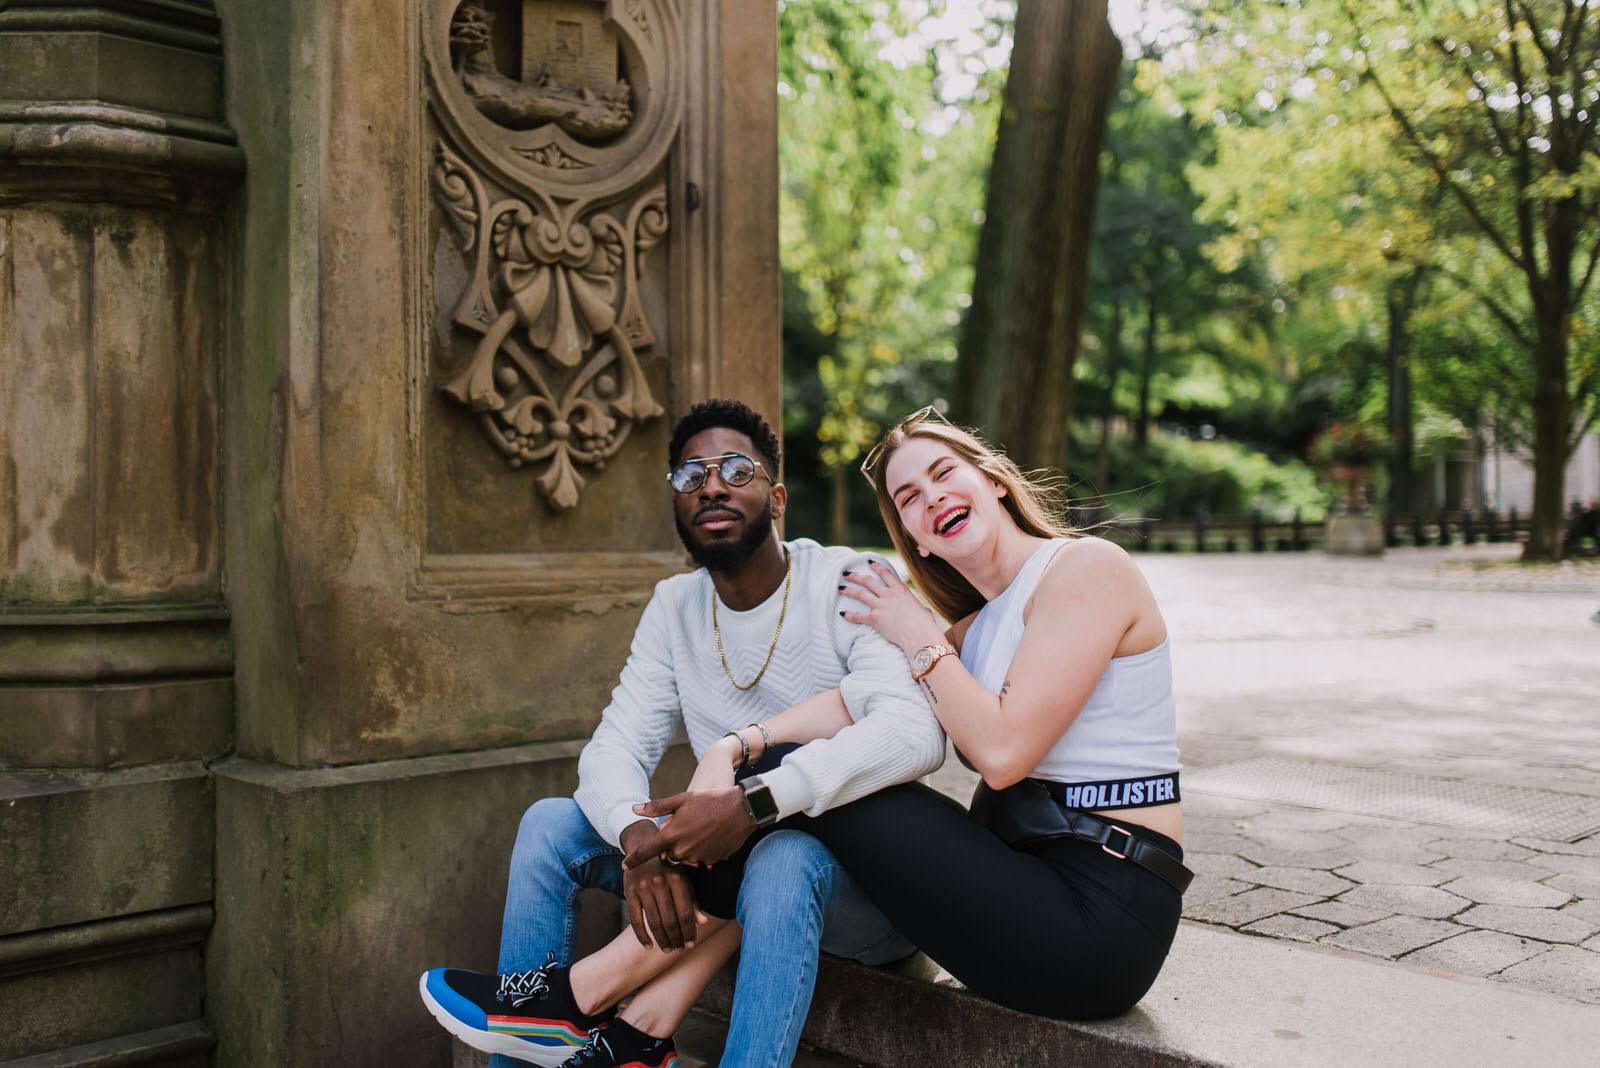 central park engagement shoot, NYC wedding photographer, NYC elopement, elopement photographer New York (6).jpg